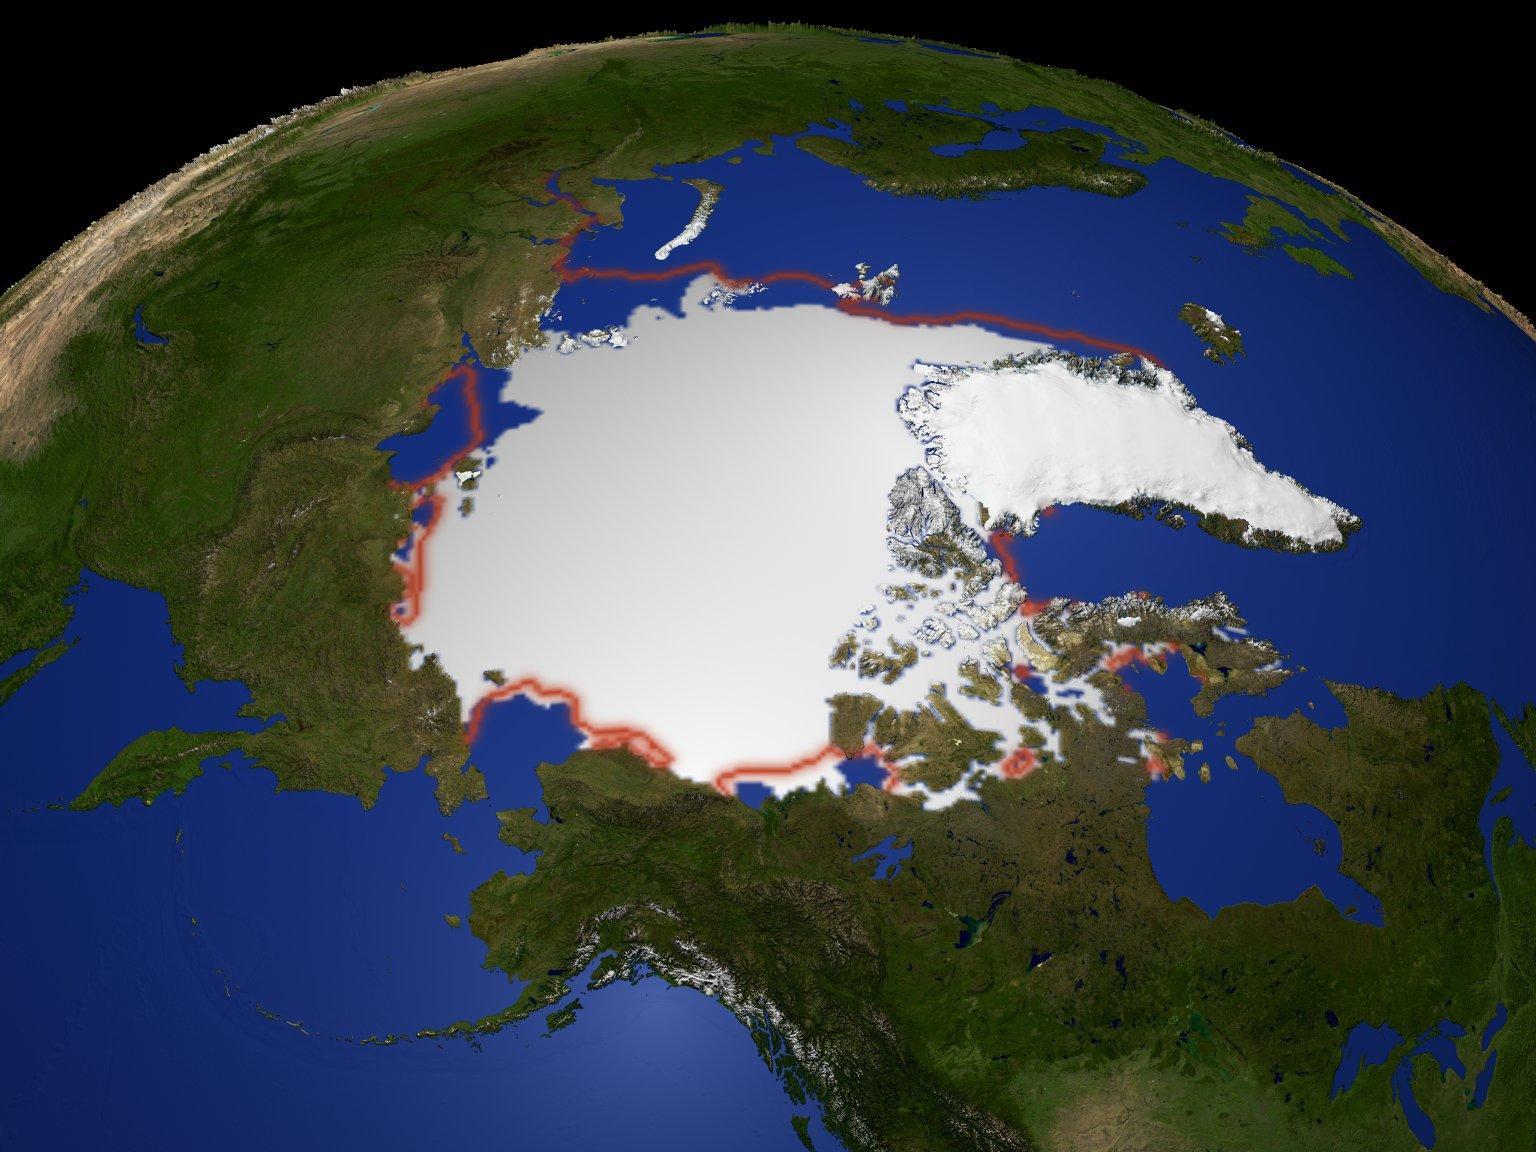 Arctic Yearly Minimum Sea Ice Extent 1979-2003